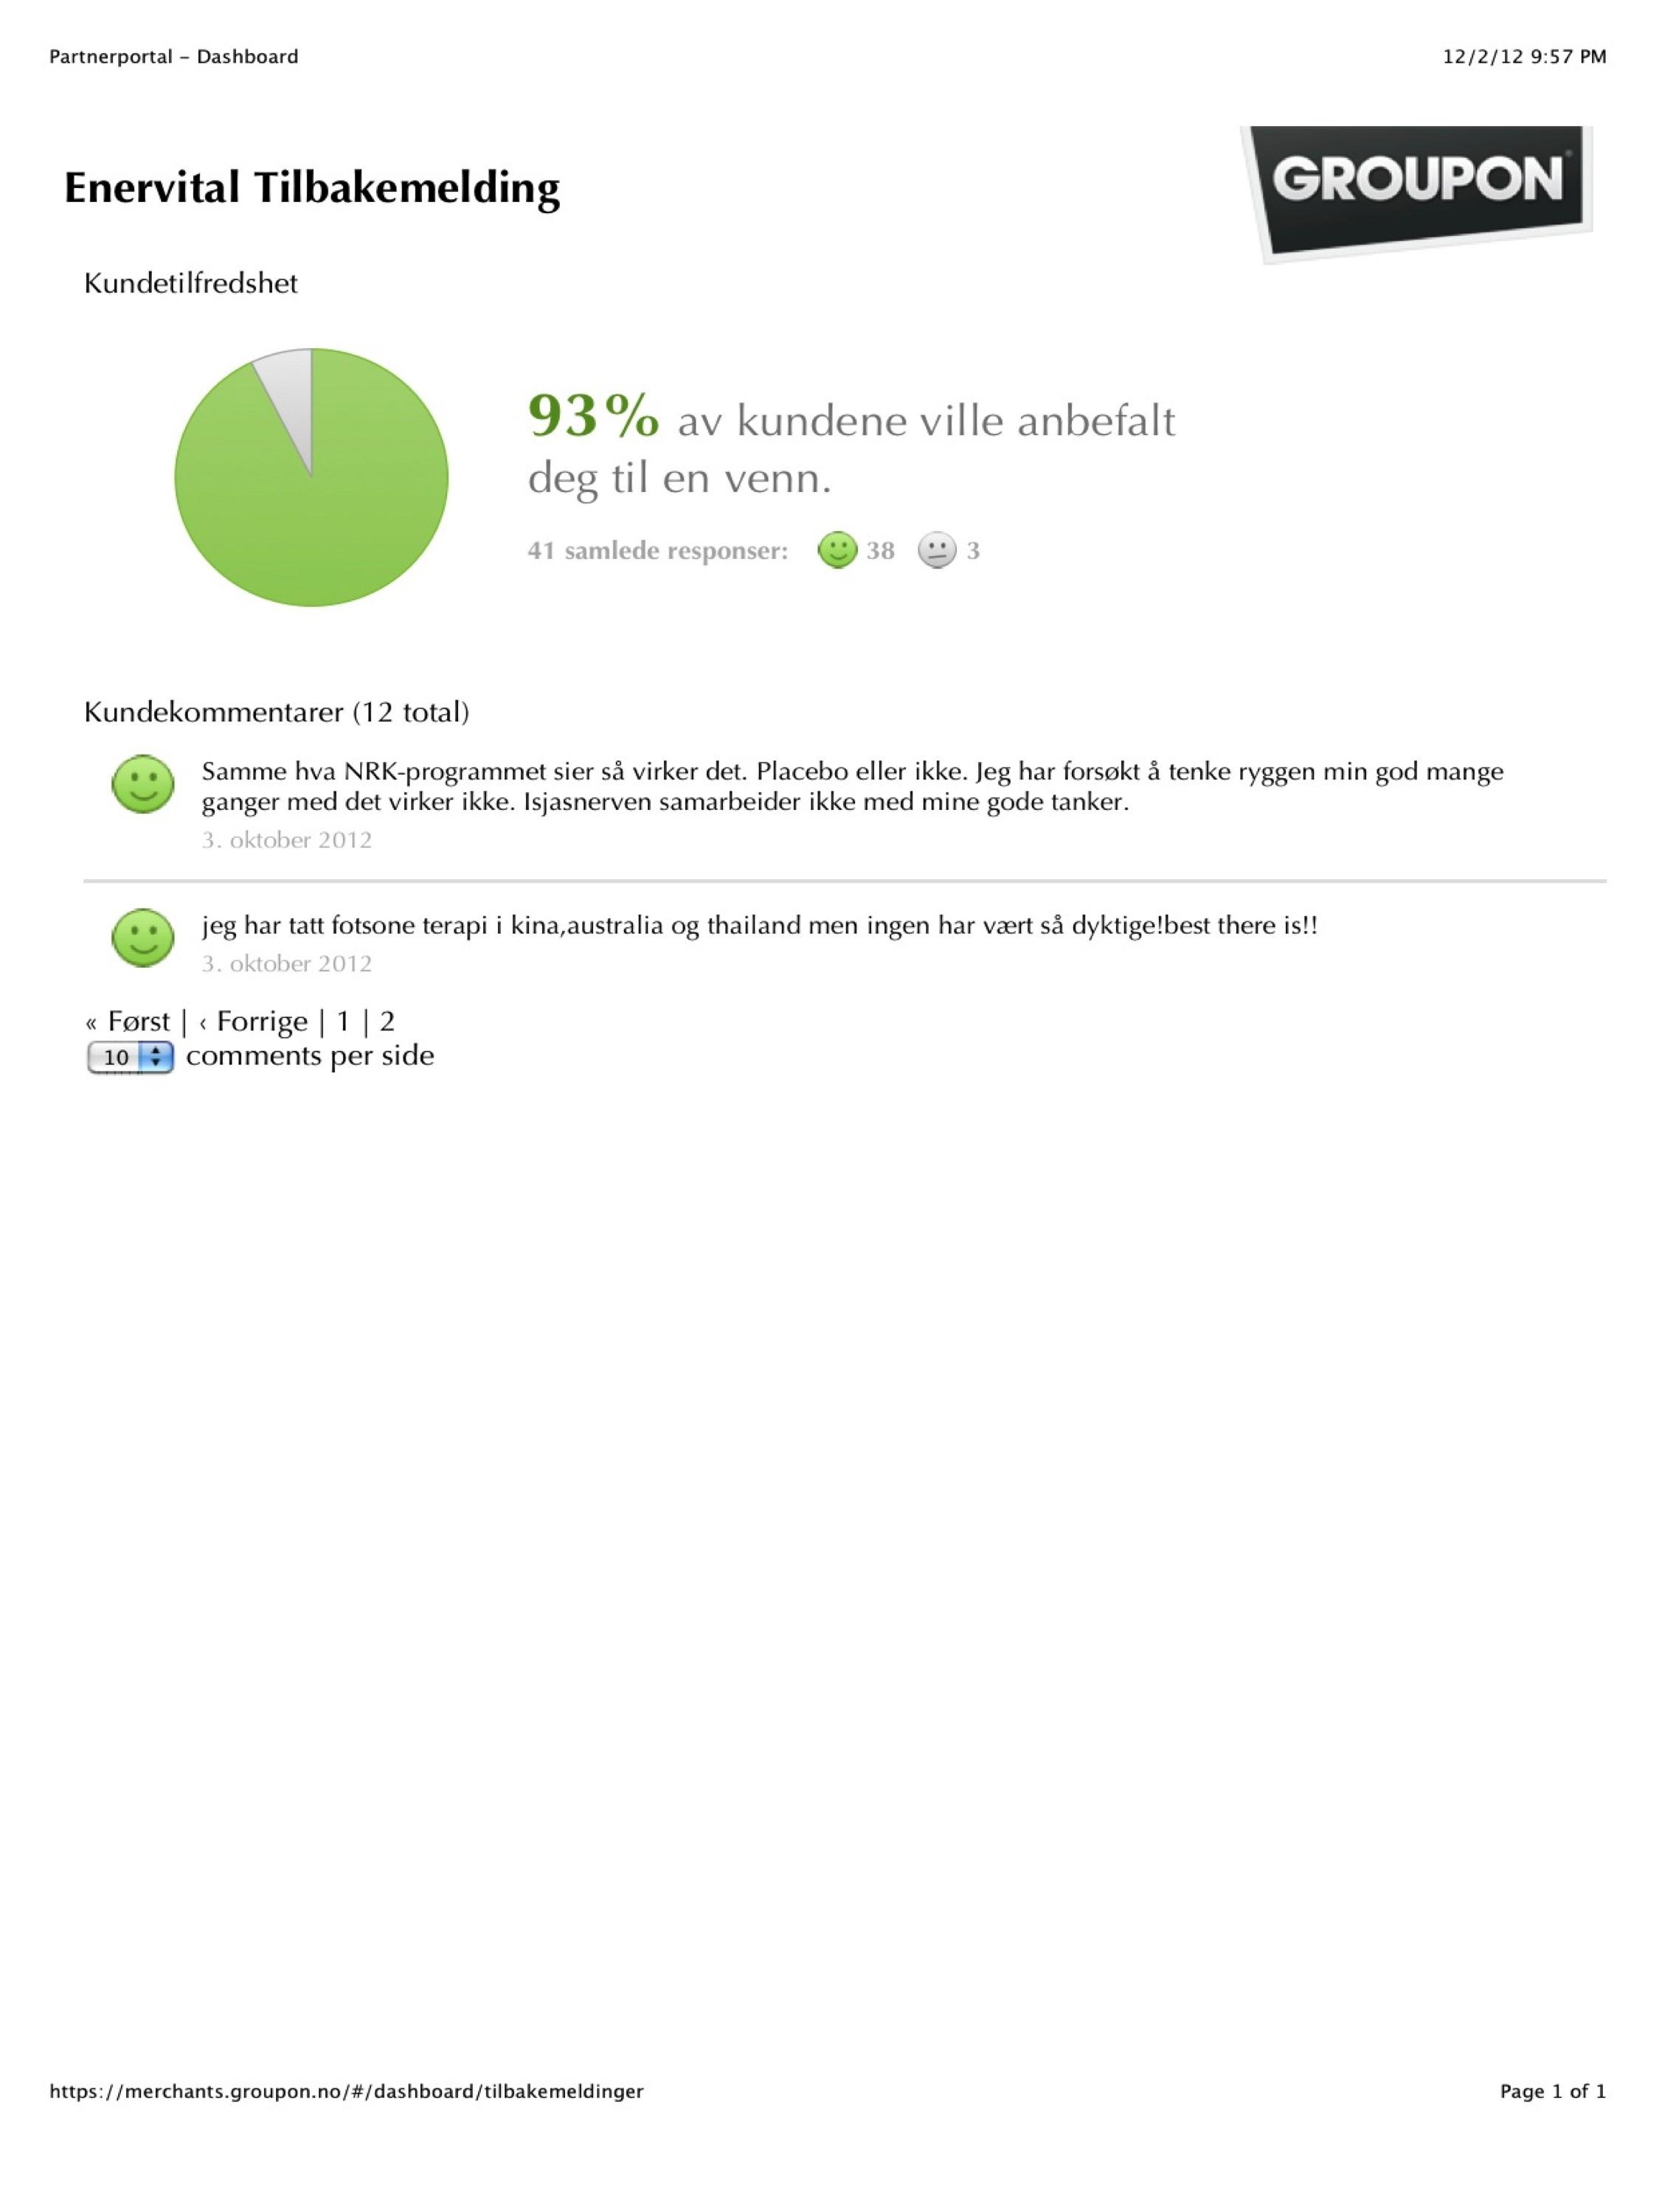 93% customer satisfaction